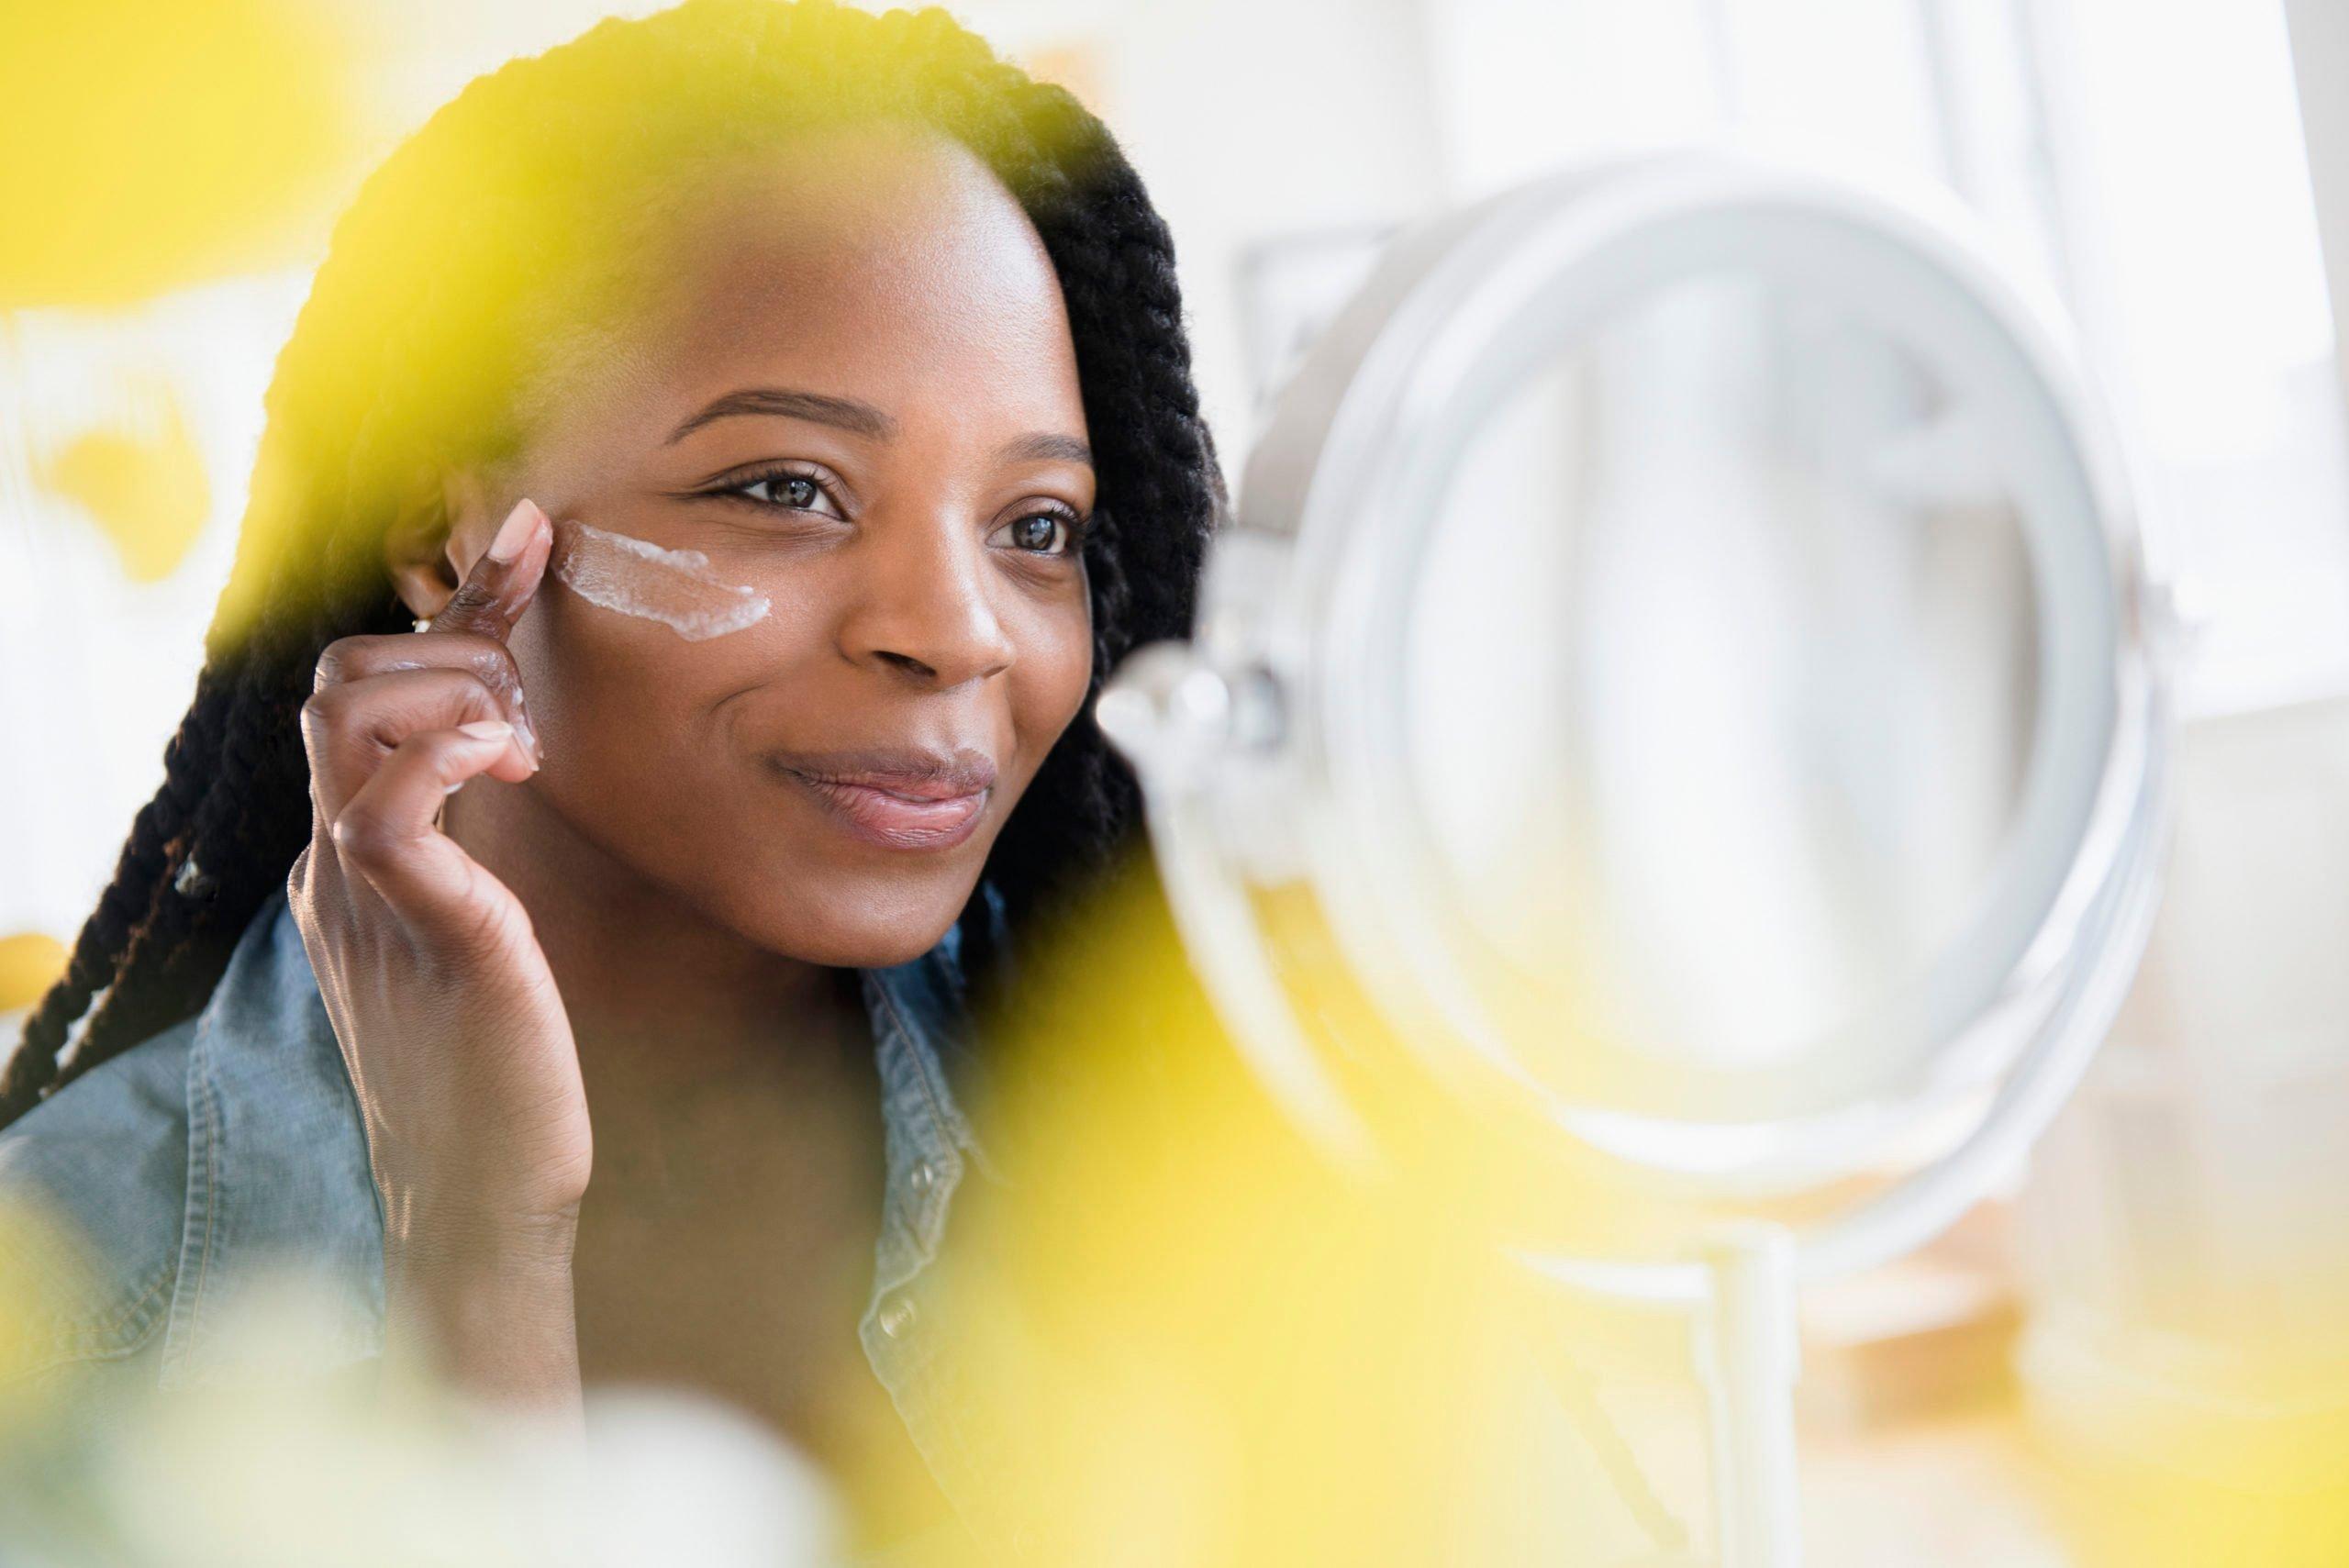 Black woman moisturizing her face